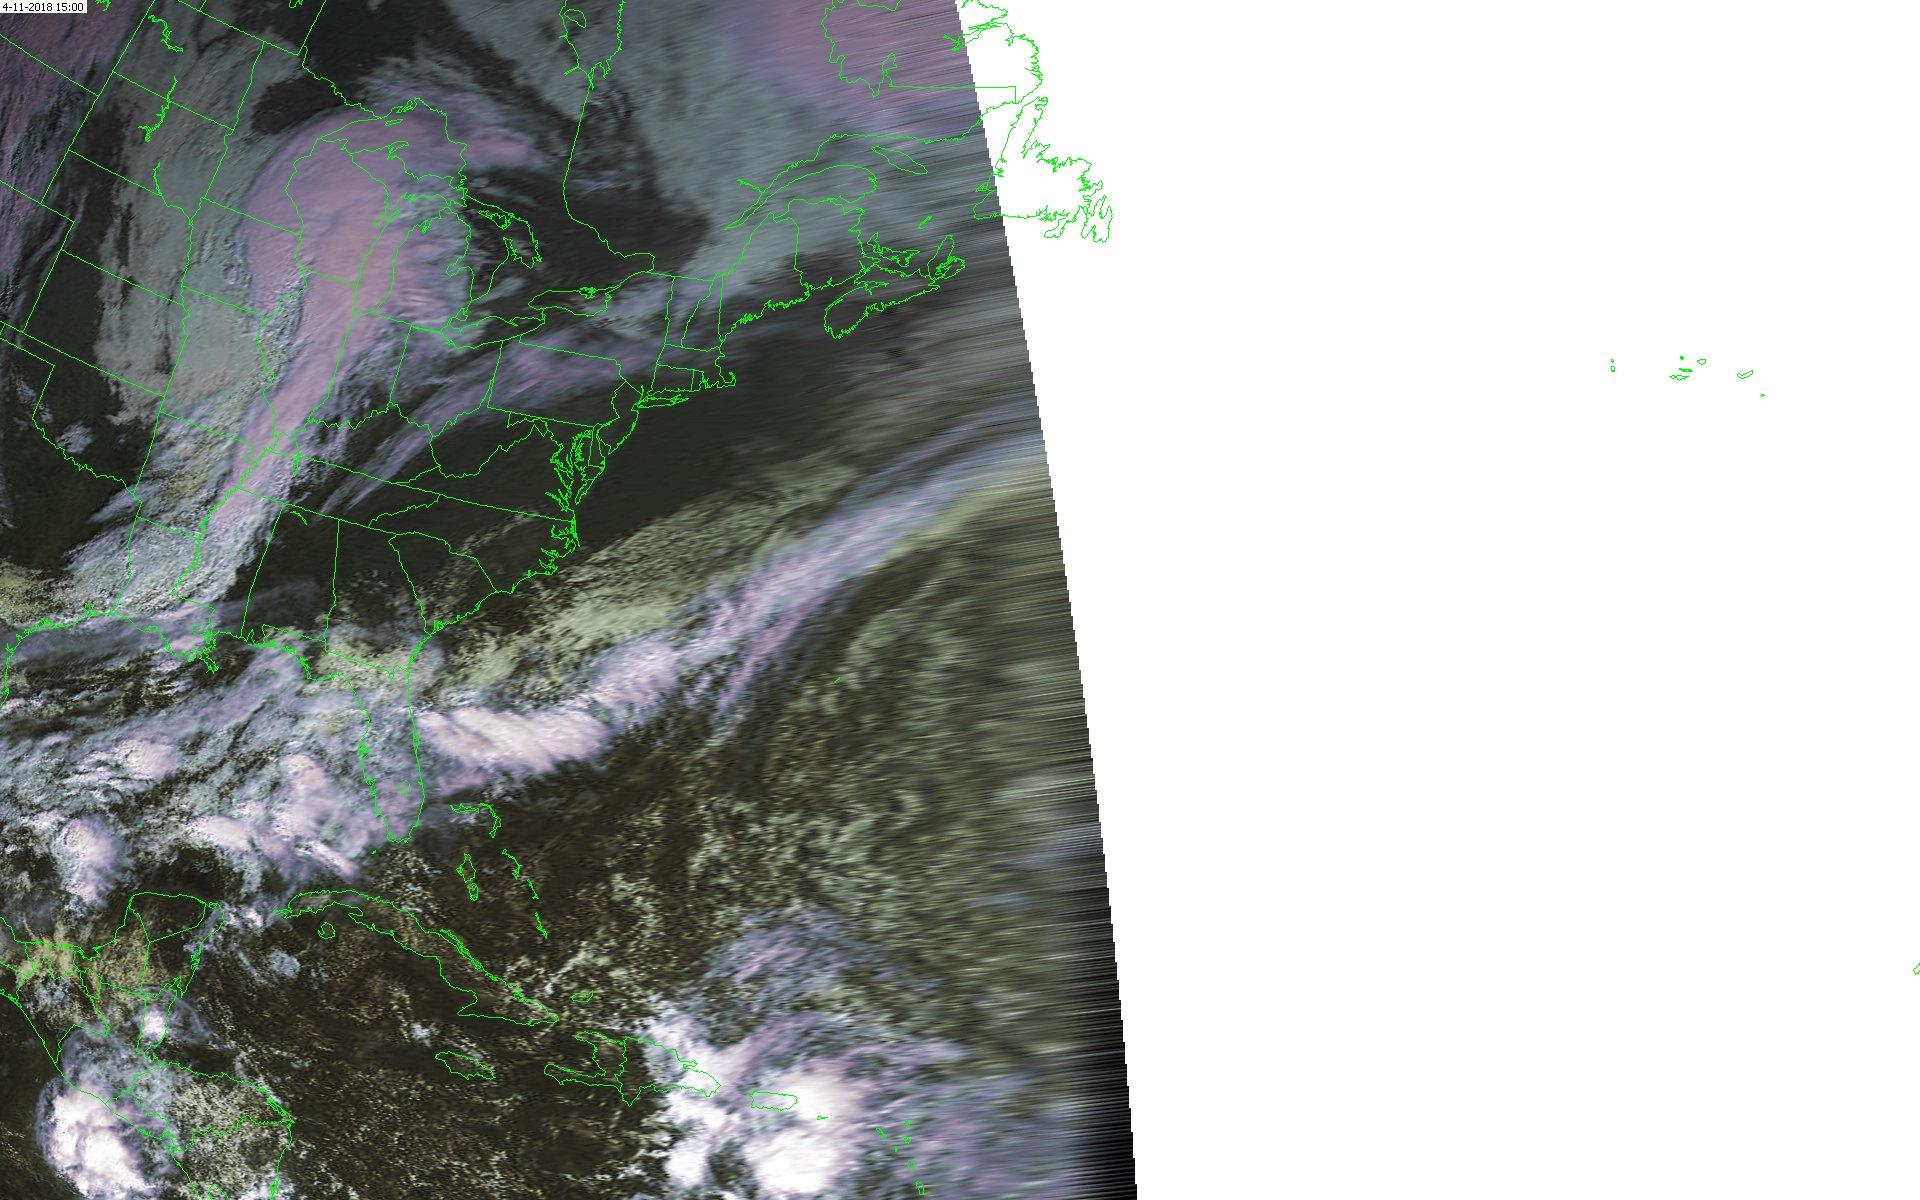 weerstation grou satelliet opname GOES E 1500UTC